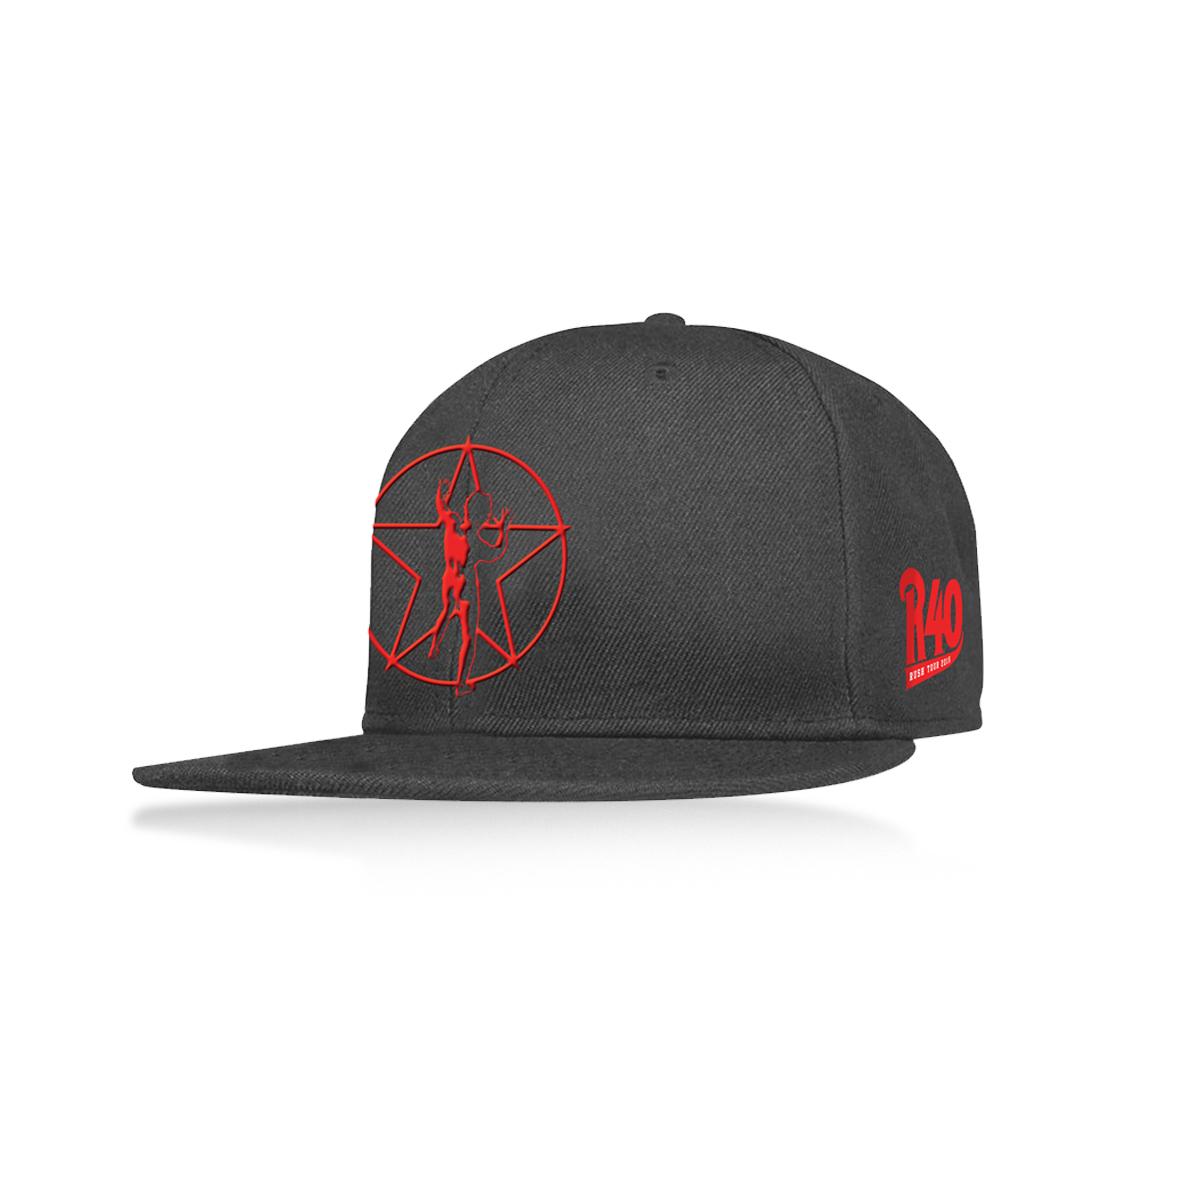 R40 Flat Brim Hat